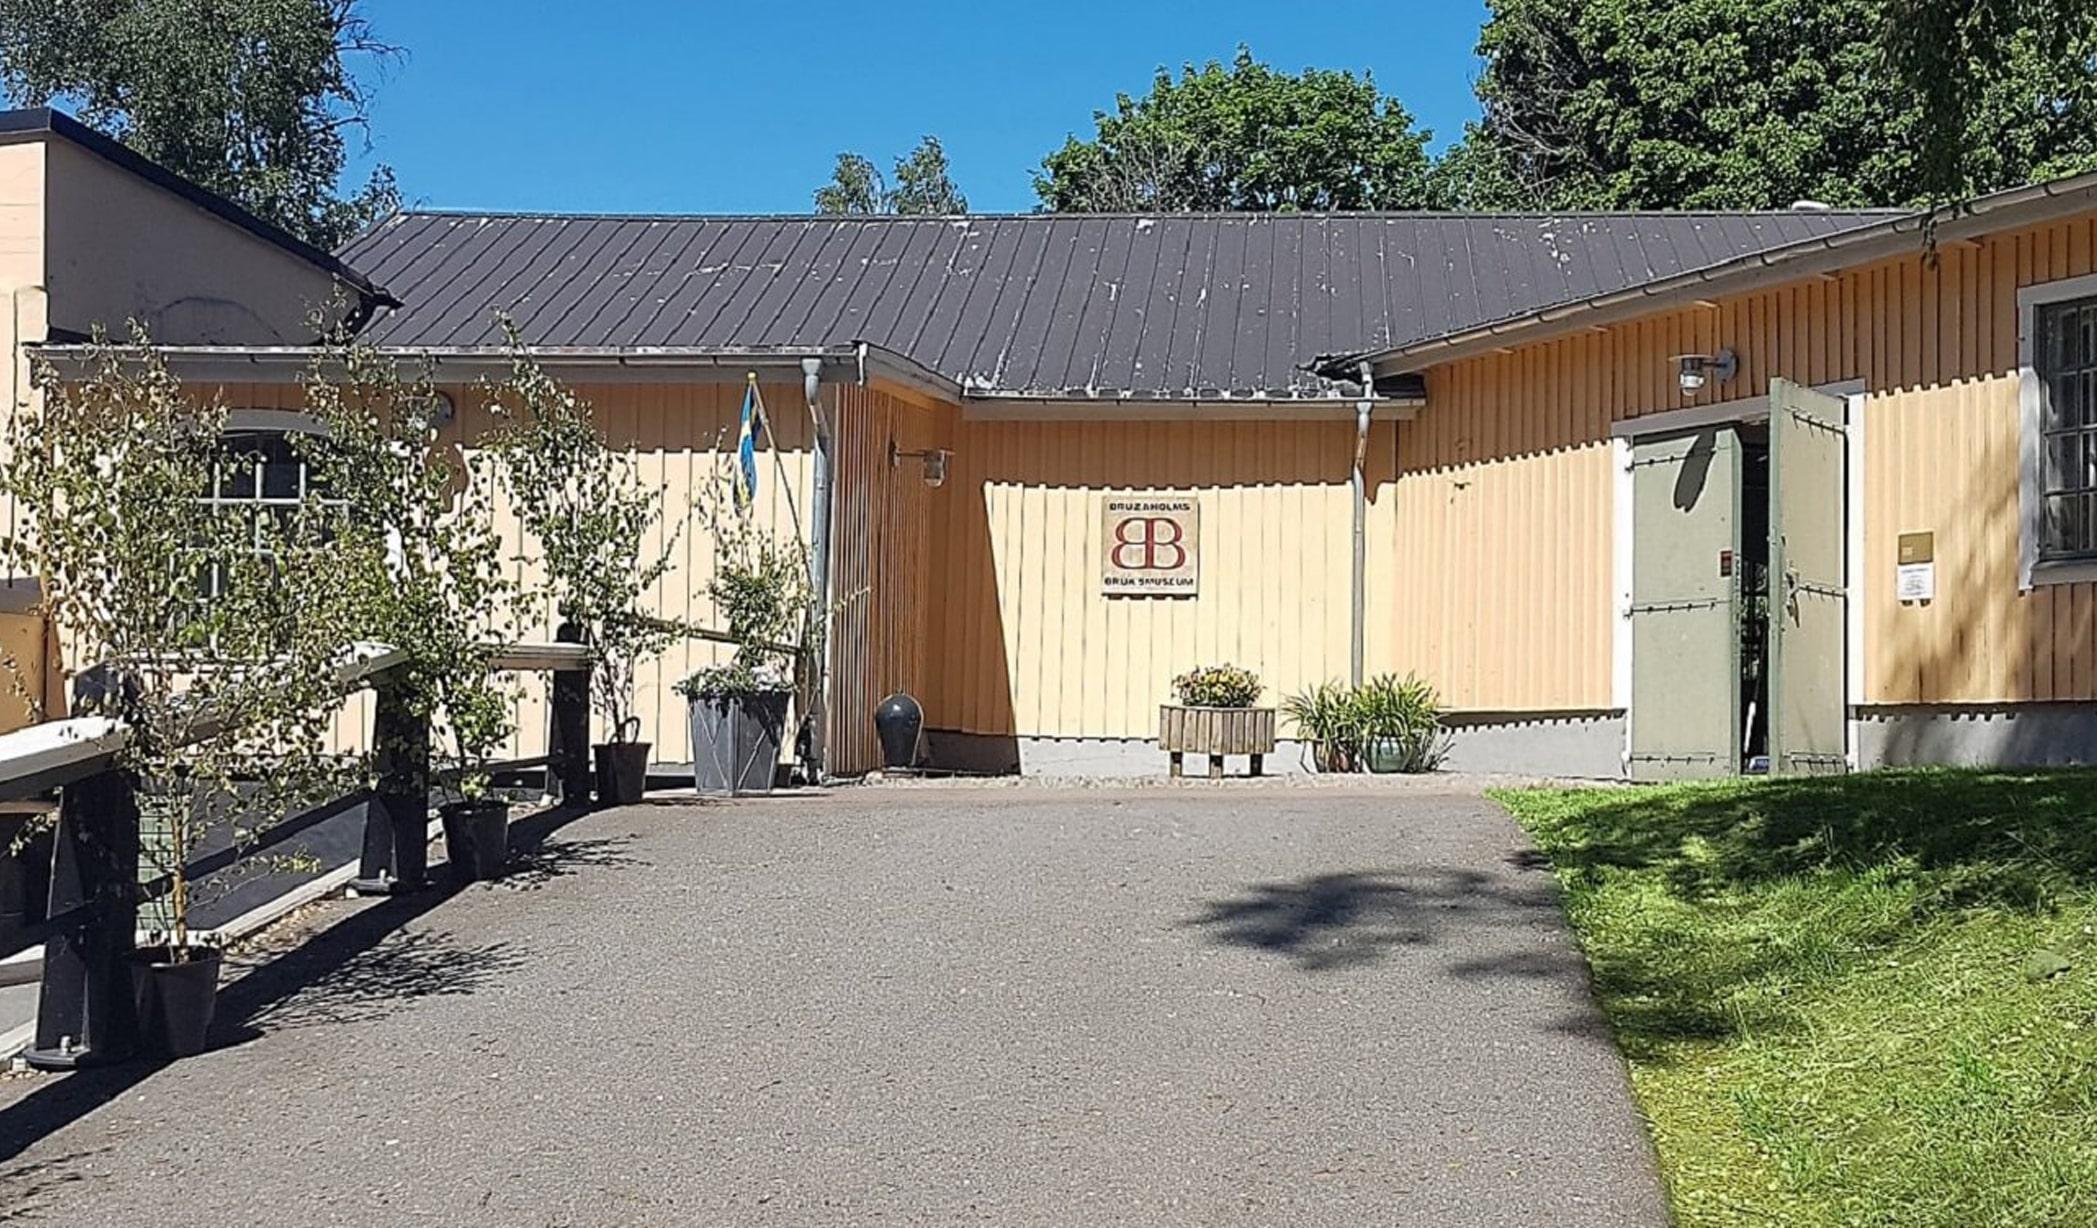 Bruzaholms Bruksmuseum Entré